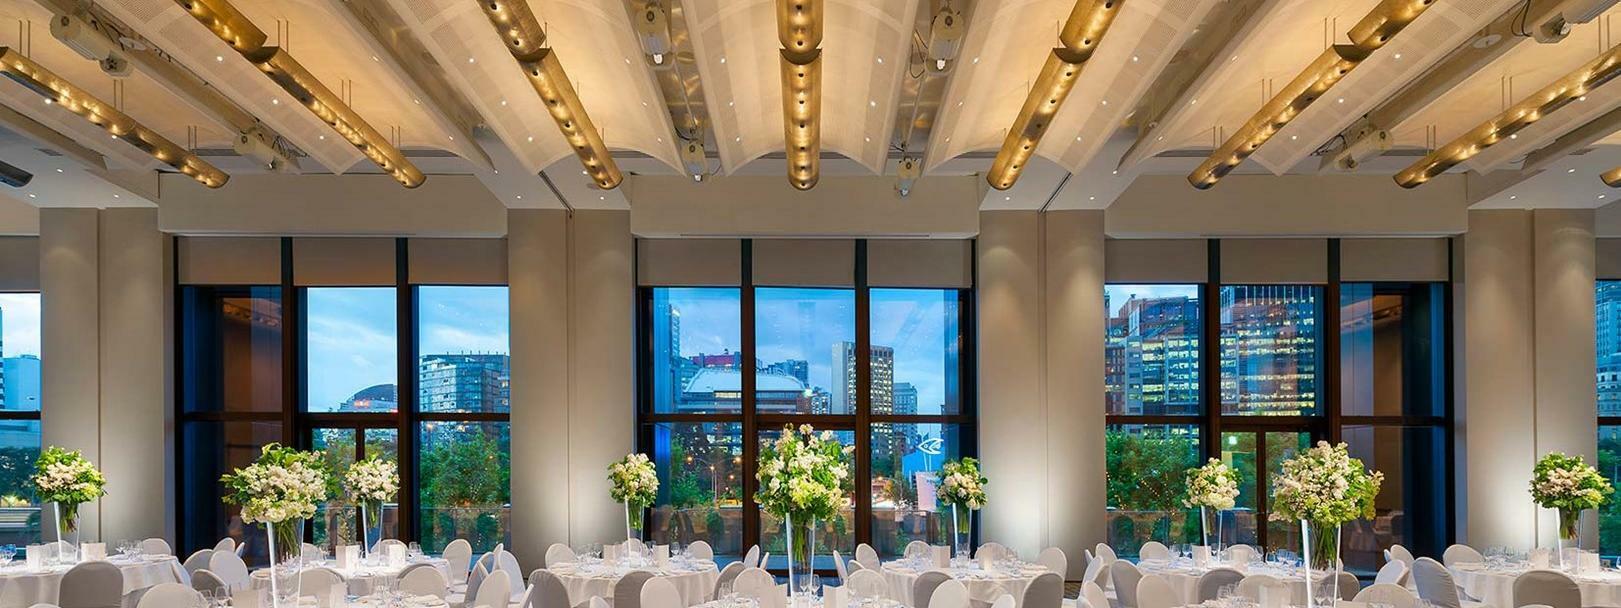 River Room at Crown Hotel Melbourne